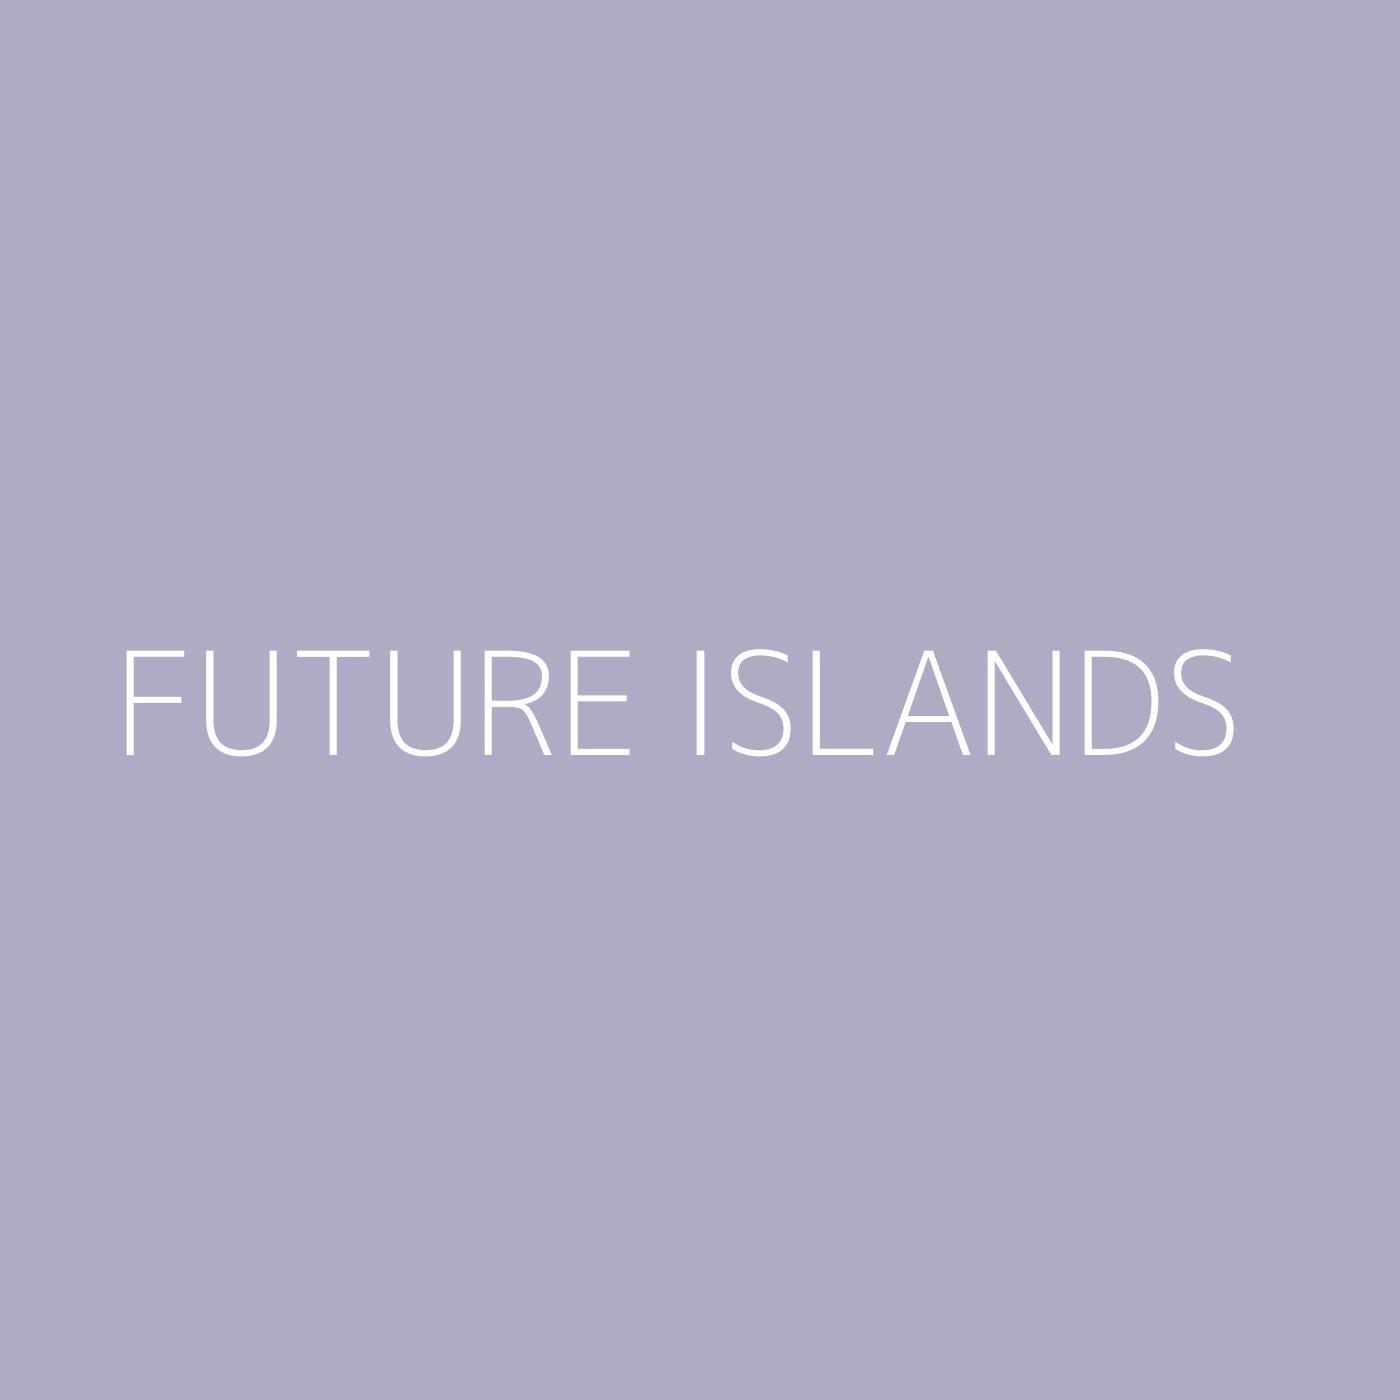 Future Islands Playlist Artwork